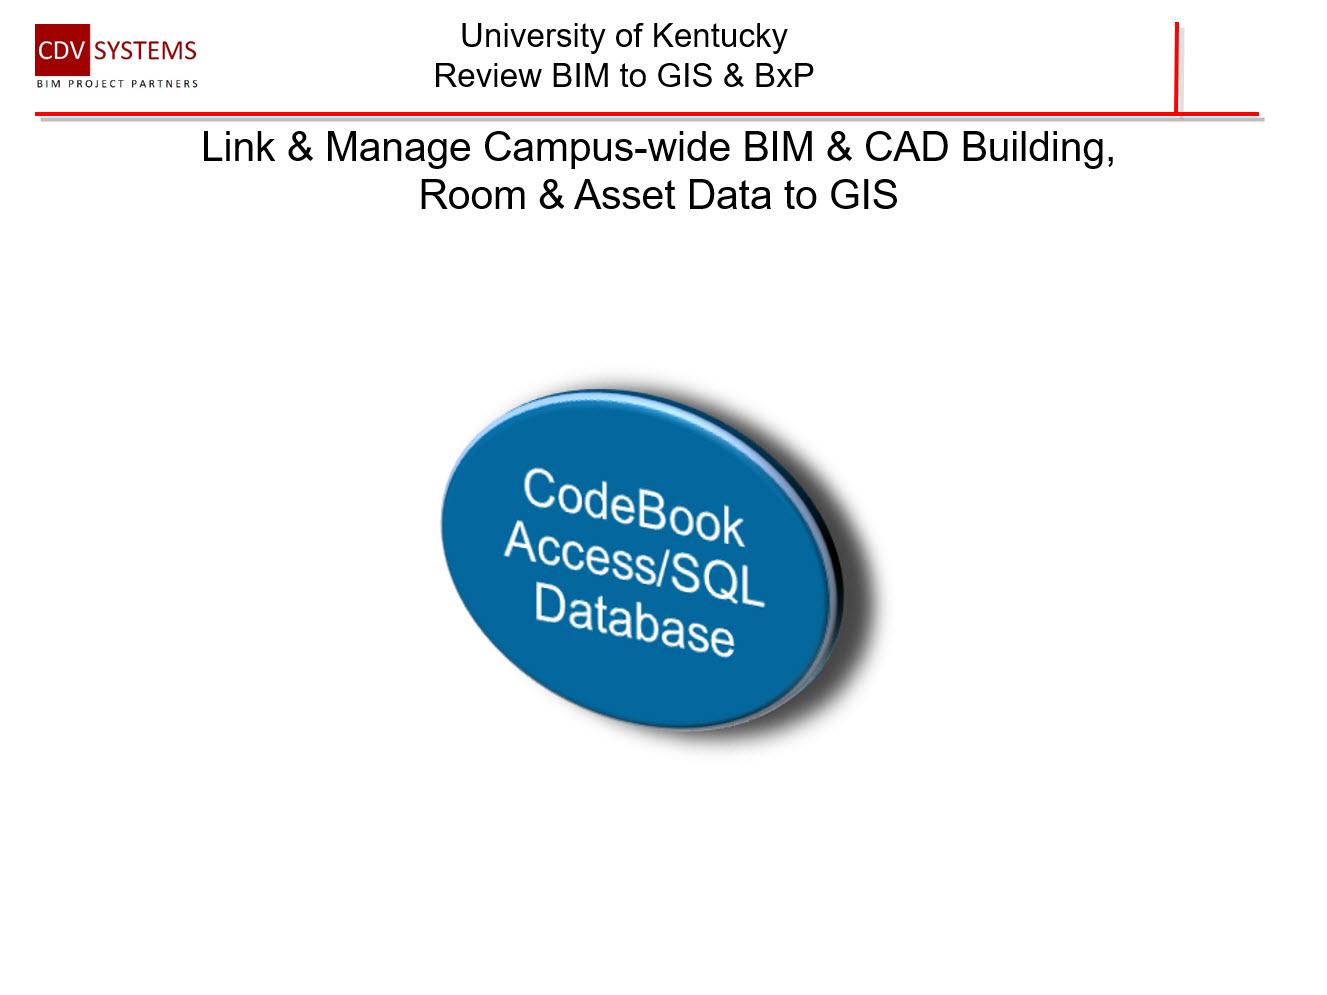 University of Kentucky_006.jpg